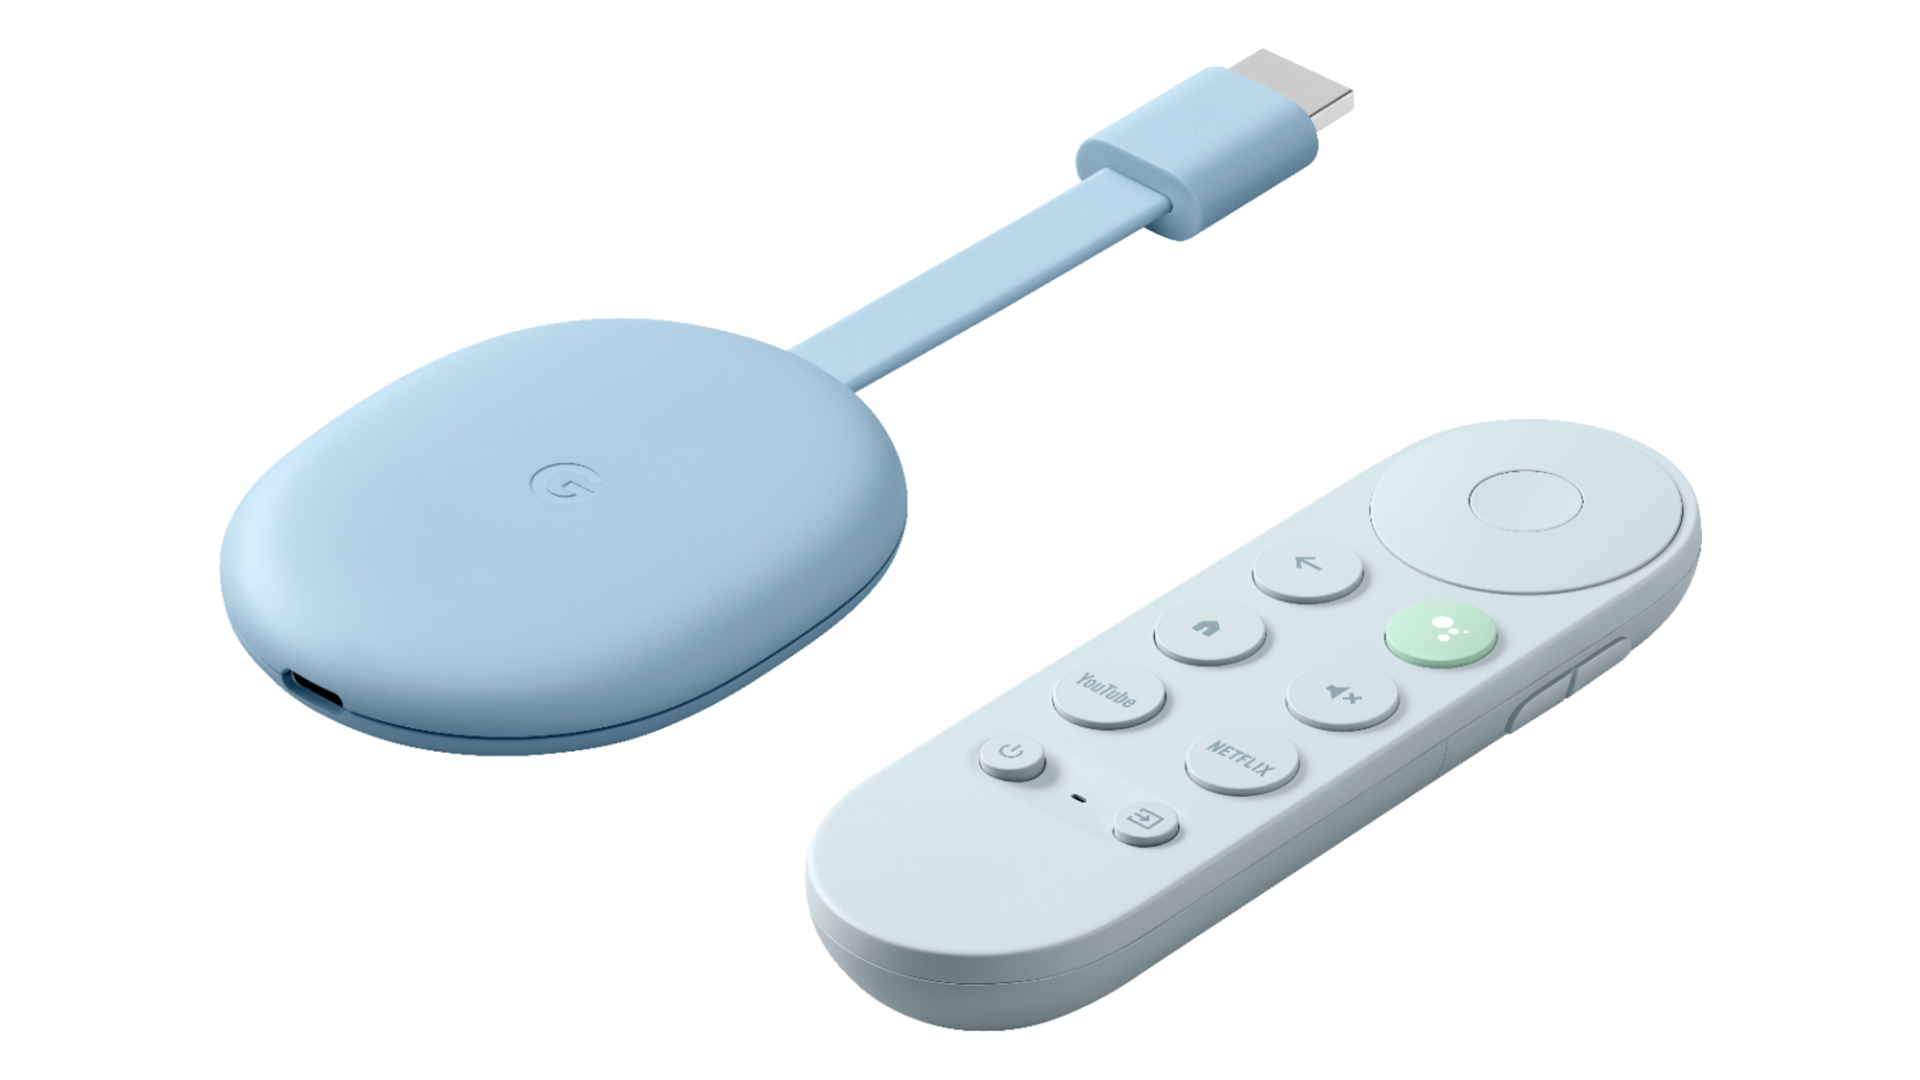 A photo of the blue Chromecast with Google TV